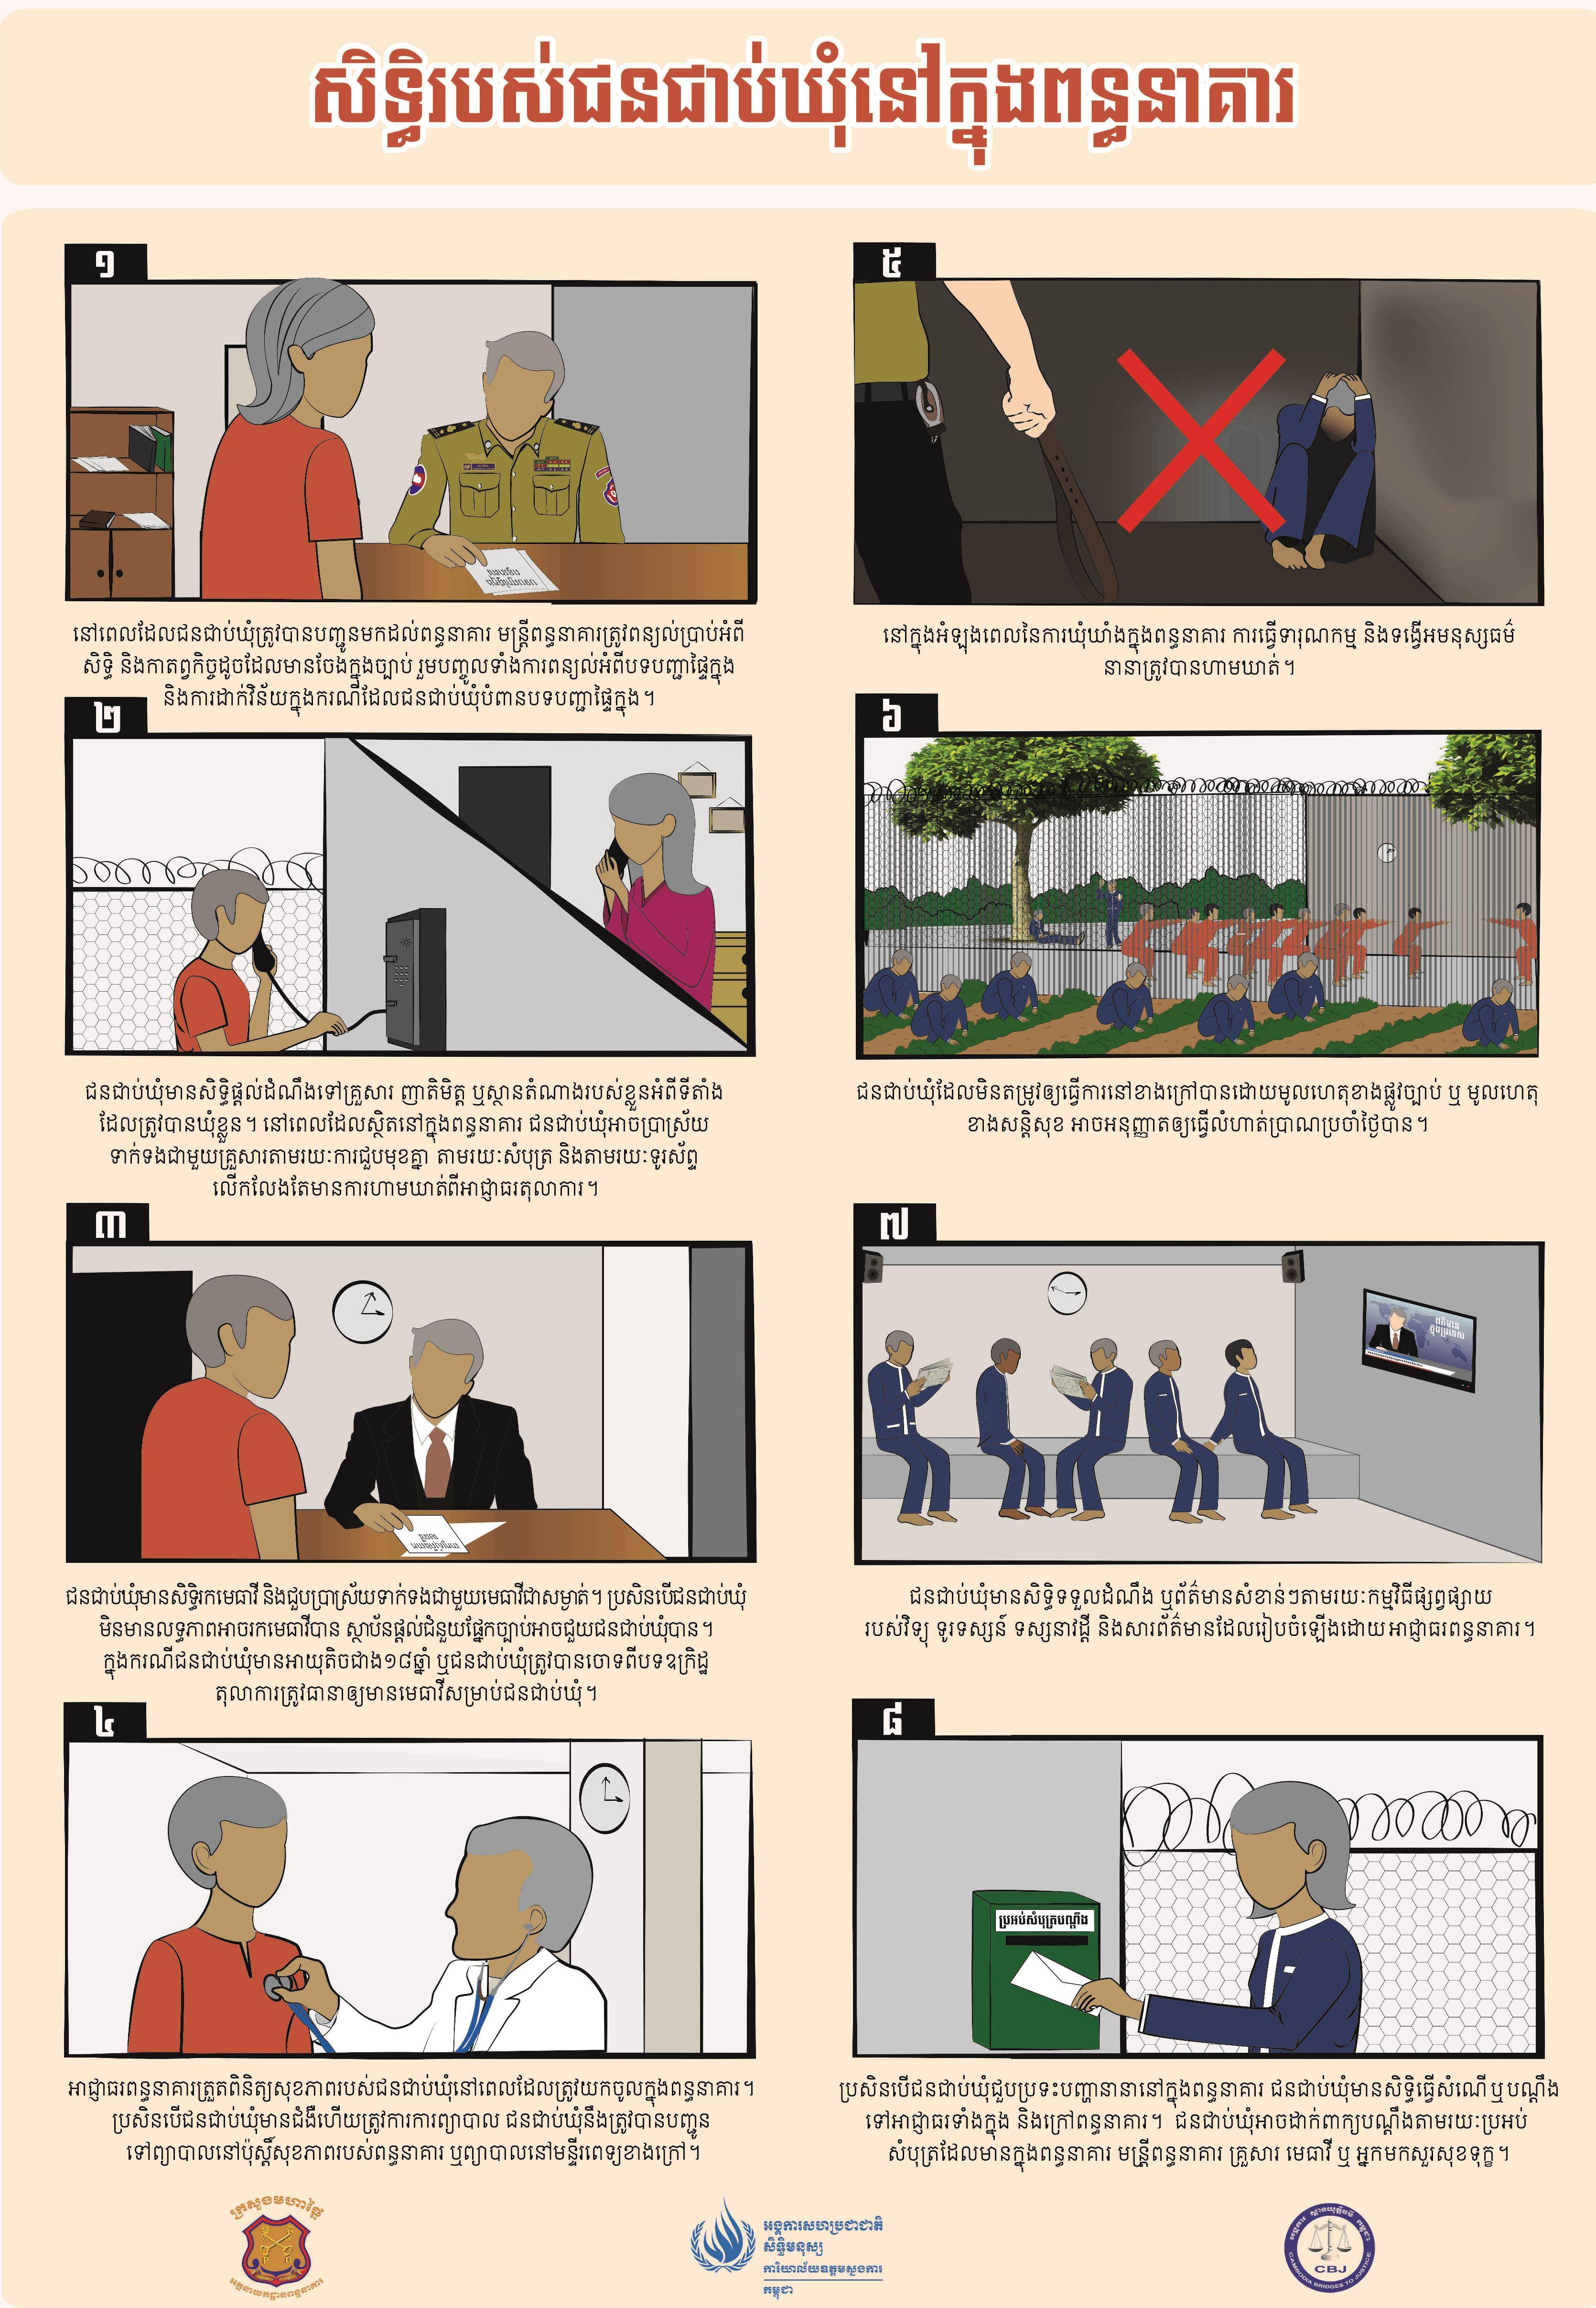 prisoners rights